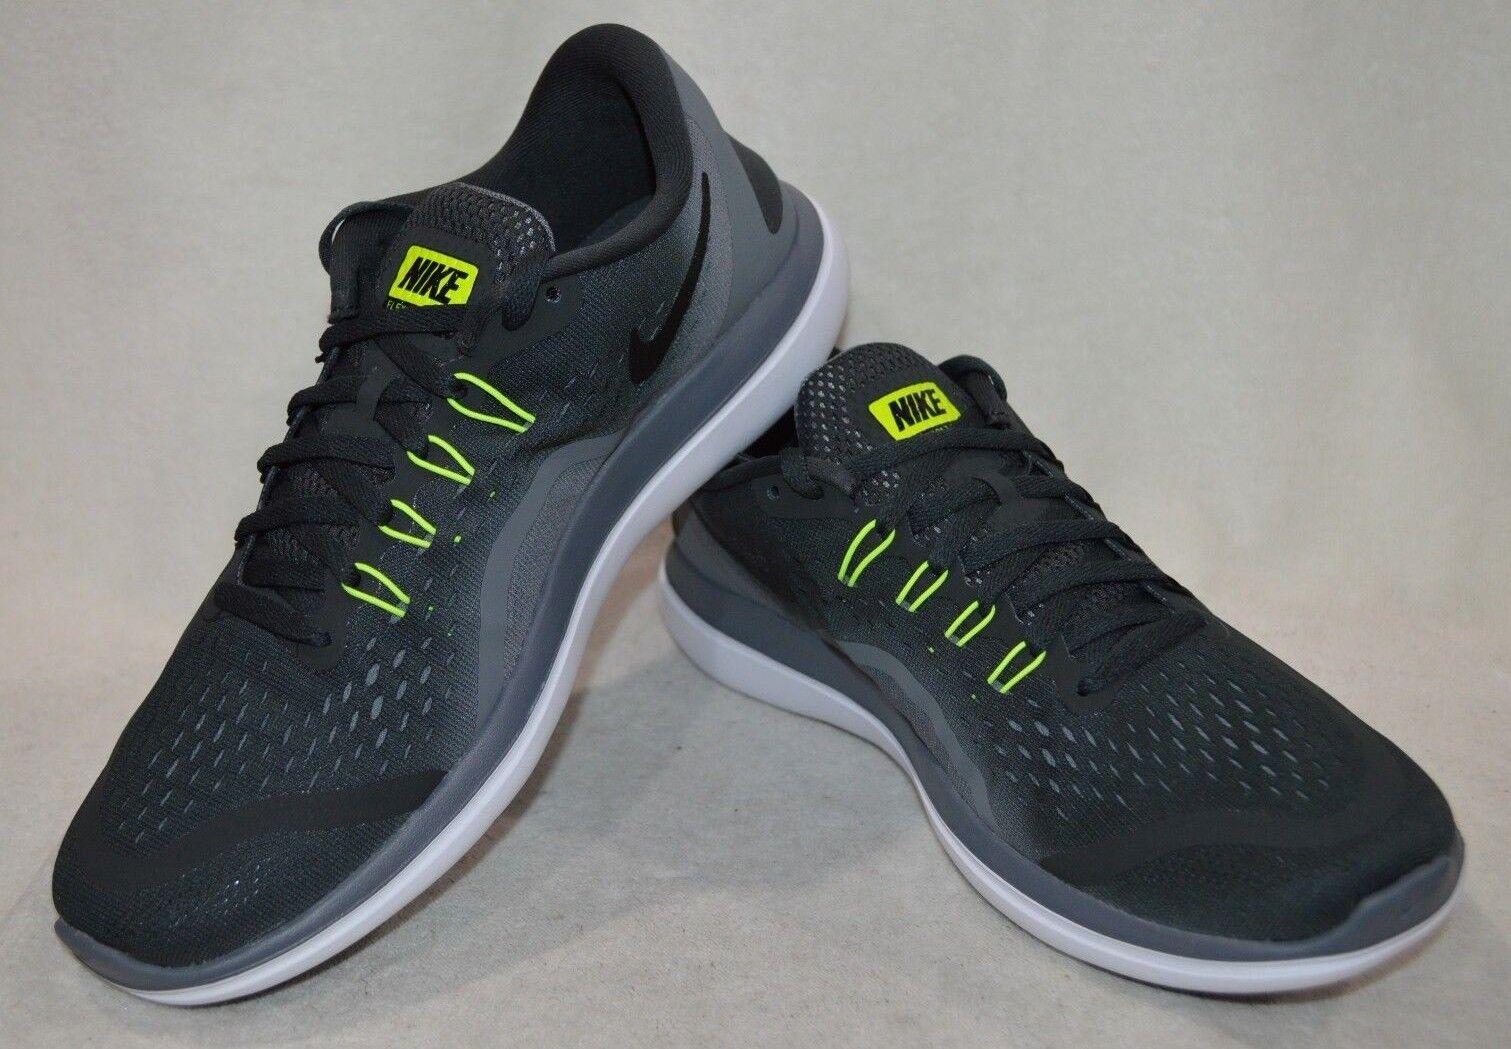 Nike Men's Flex 2017 RN Anthracite Volt Grey Running shoes-Assorted Sizes NWB